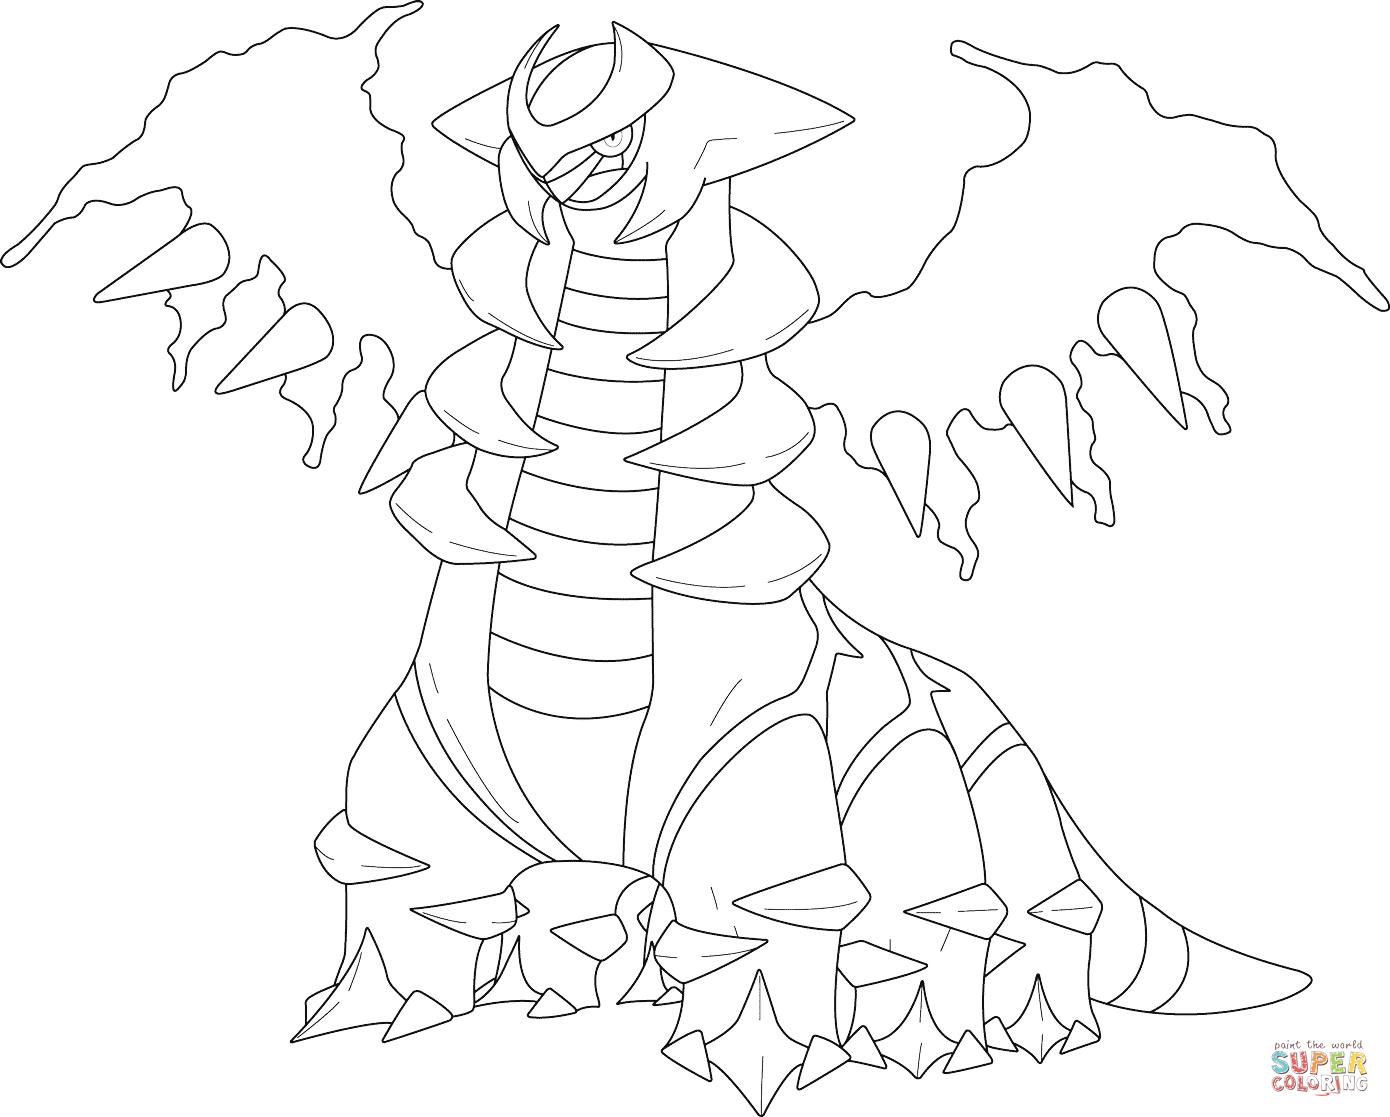 Legendary Pokémon Giratina Pokemon coloring pages